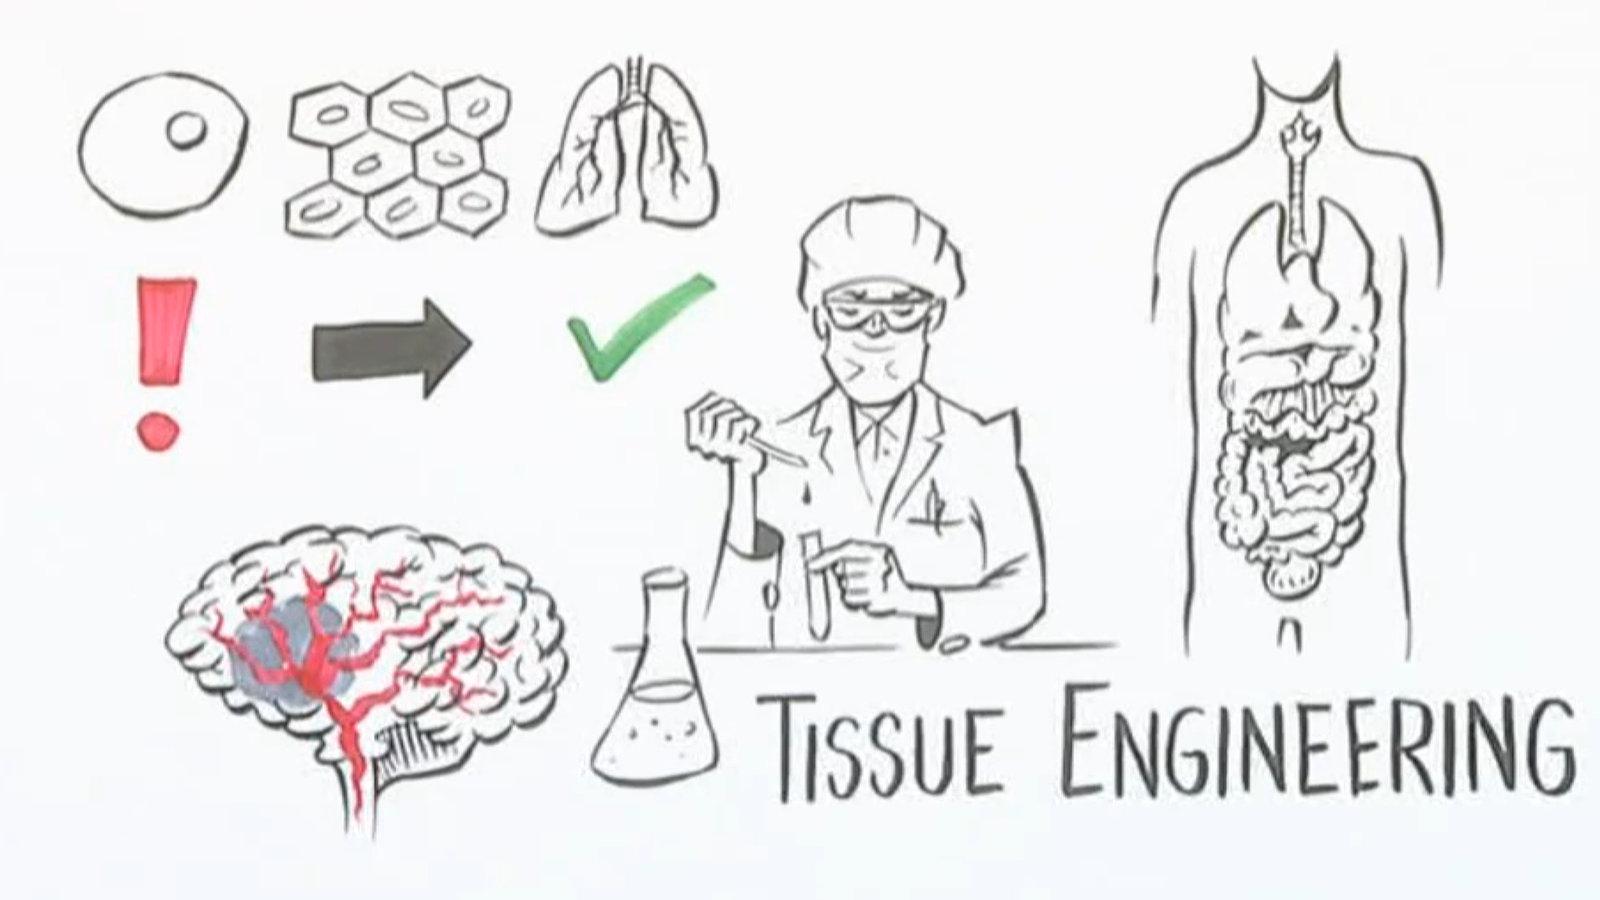 Stammzellen: Heilen mit Stammzellen - Stammzellen - Forschung ...